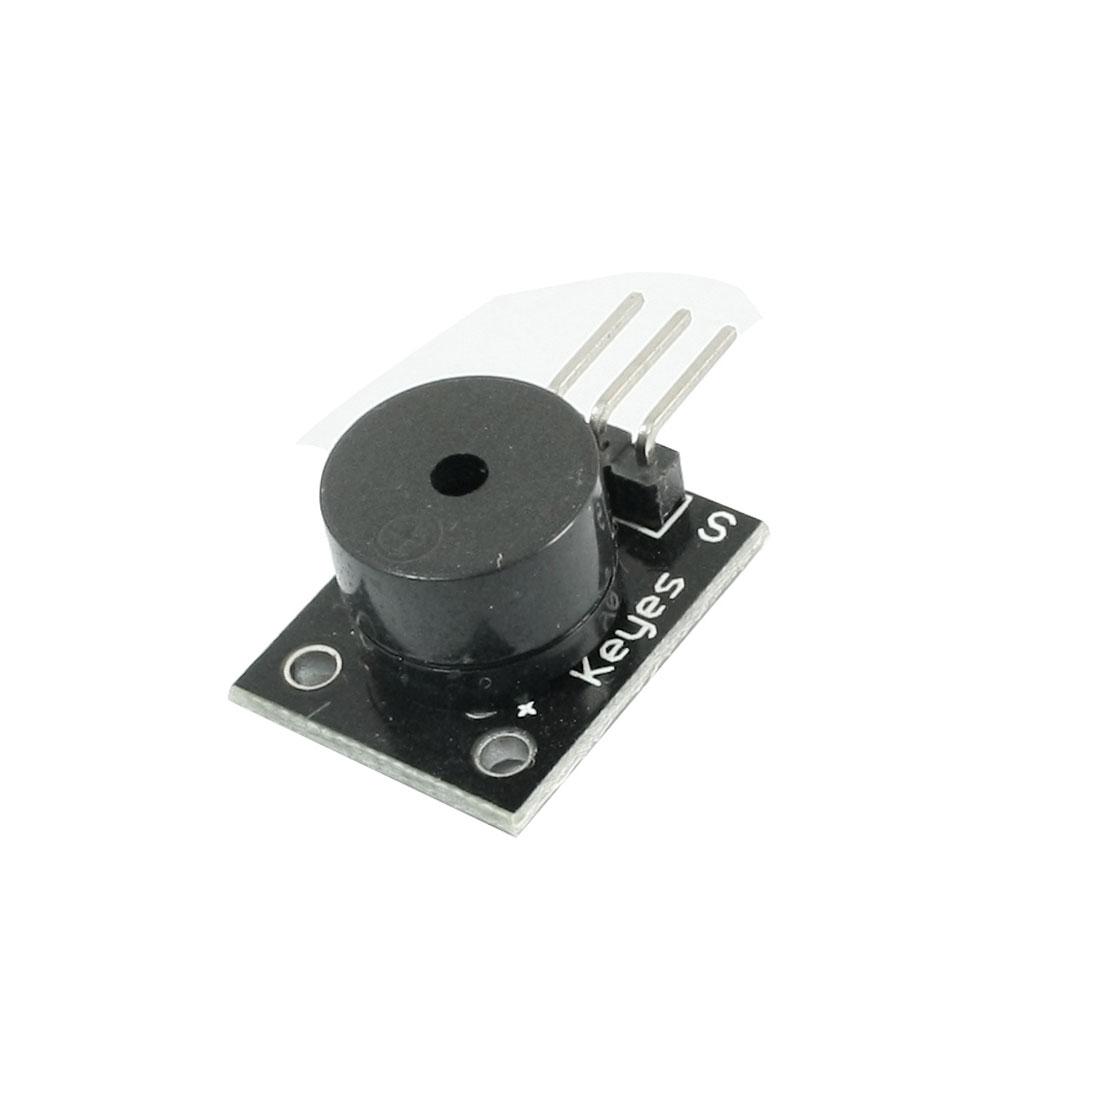 DC3.5-5.5V Passive Speaker Buzzer Module for AVR PIC